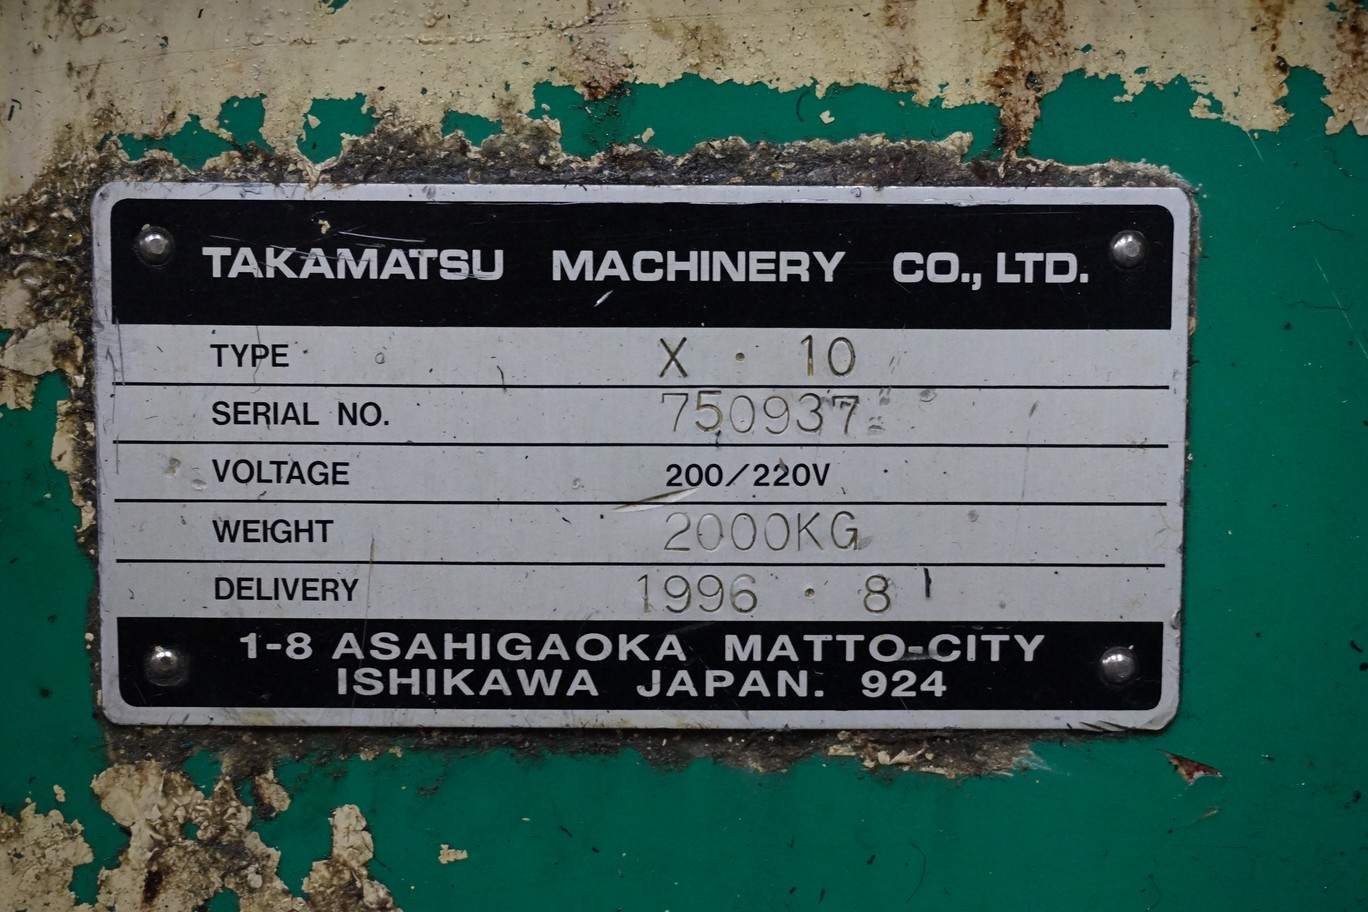 Takamatsu Model X10 CNC Lathe 200/220V c/w Chip Conveyor, Transformer - Image 3 of 5